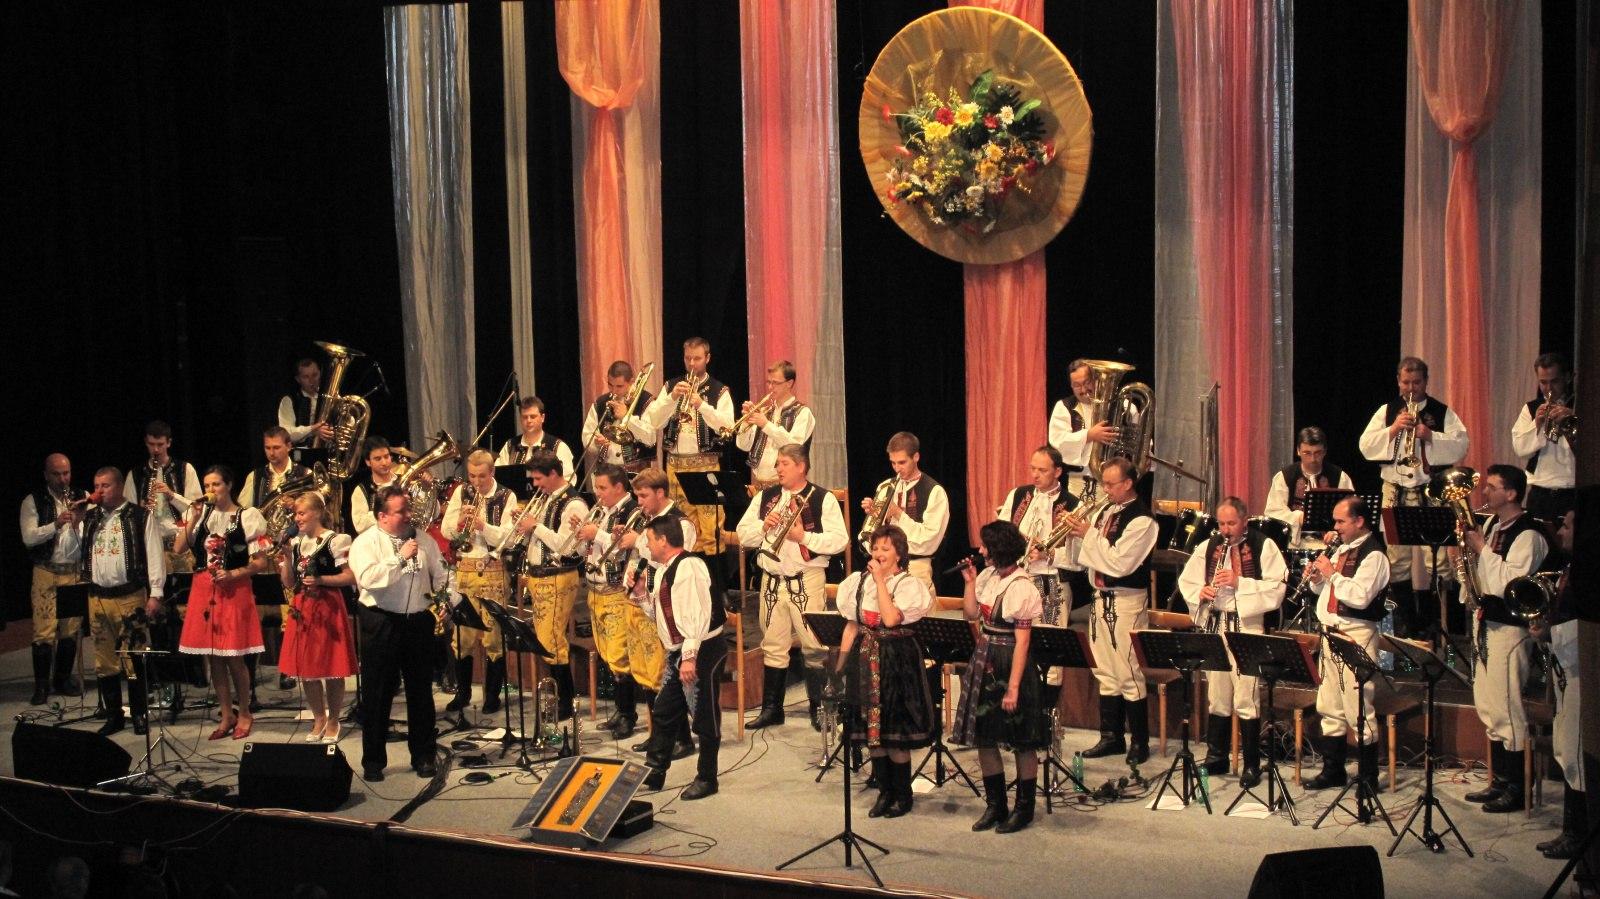 Koncert s DH Legrúti – Hodonín